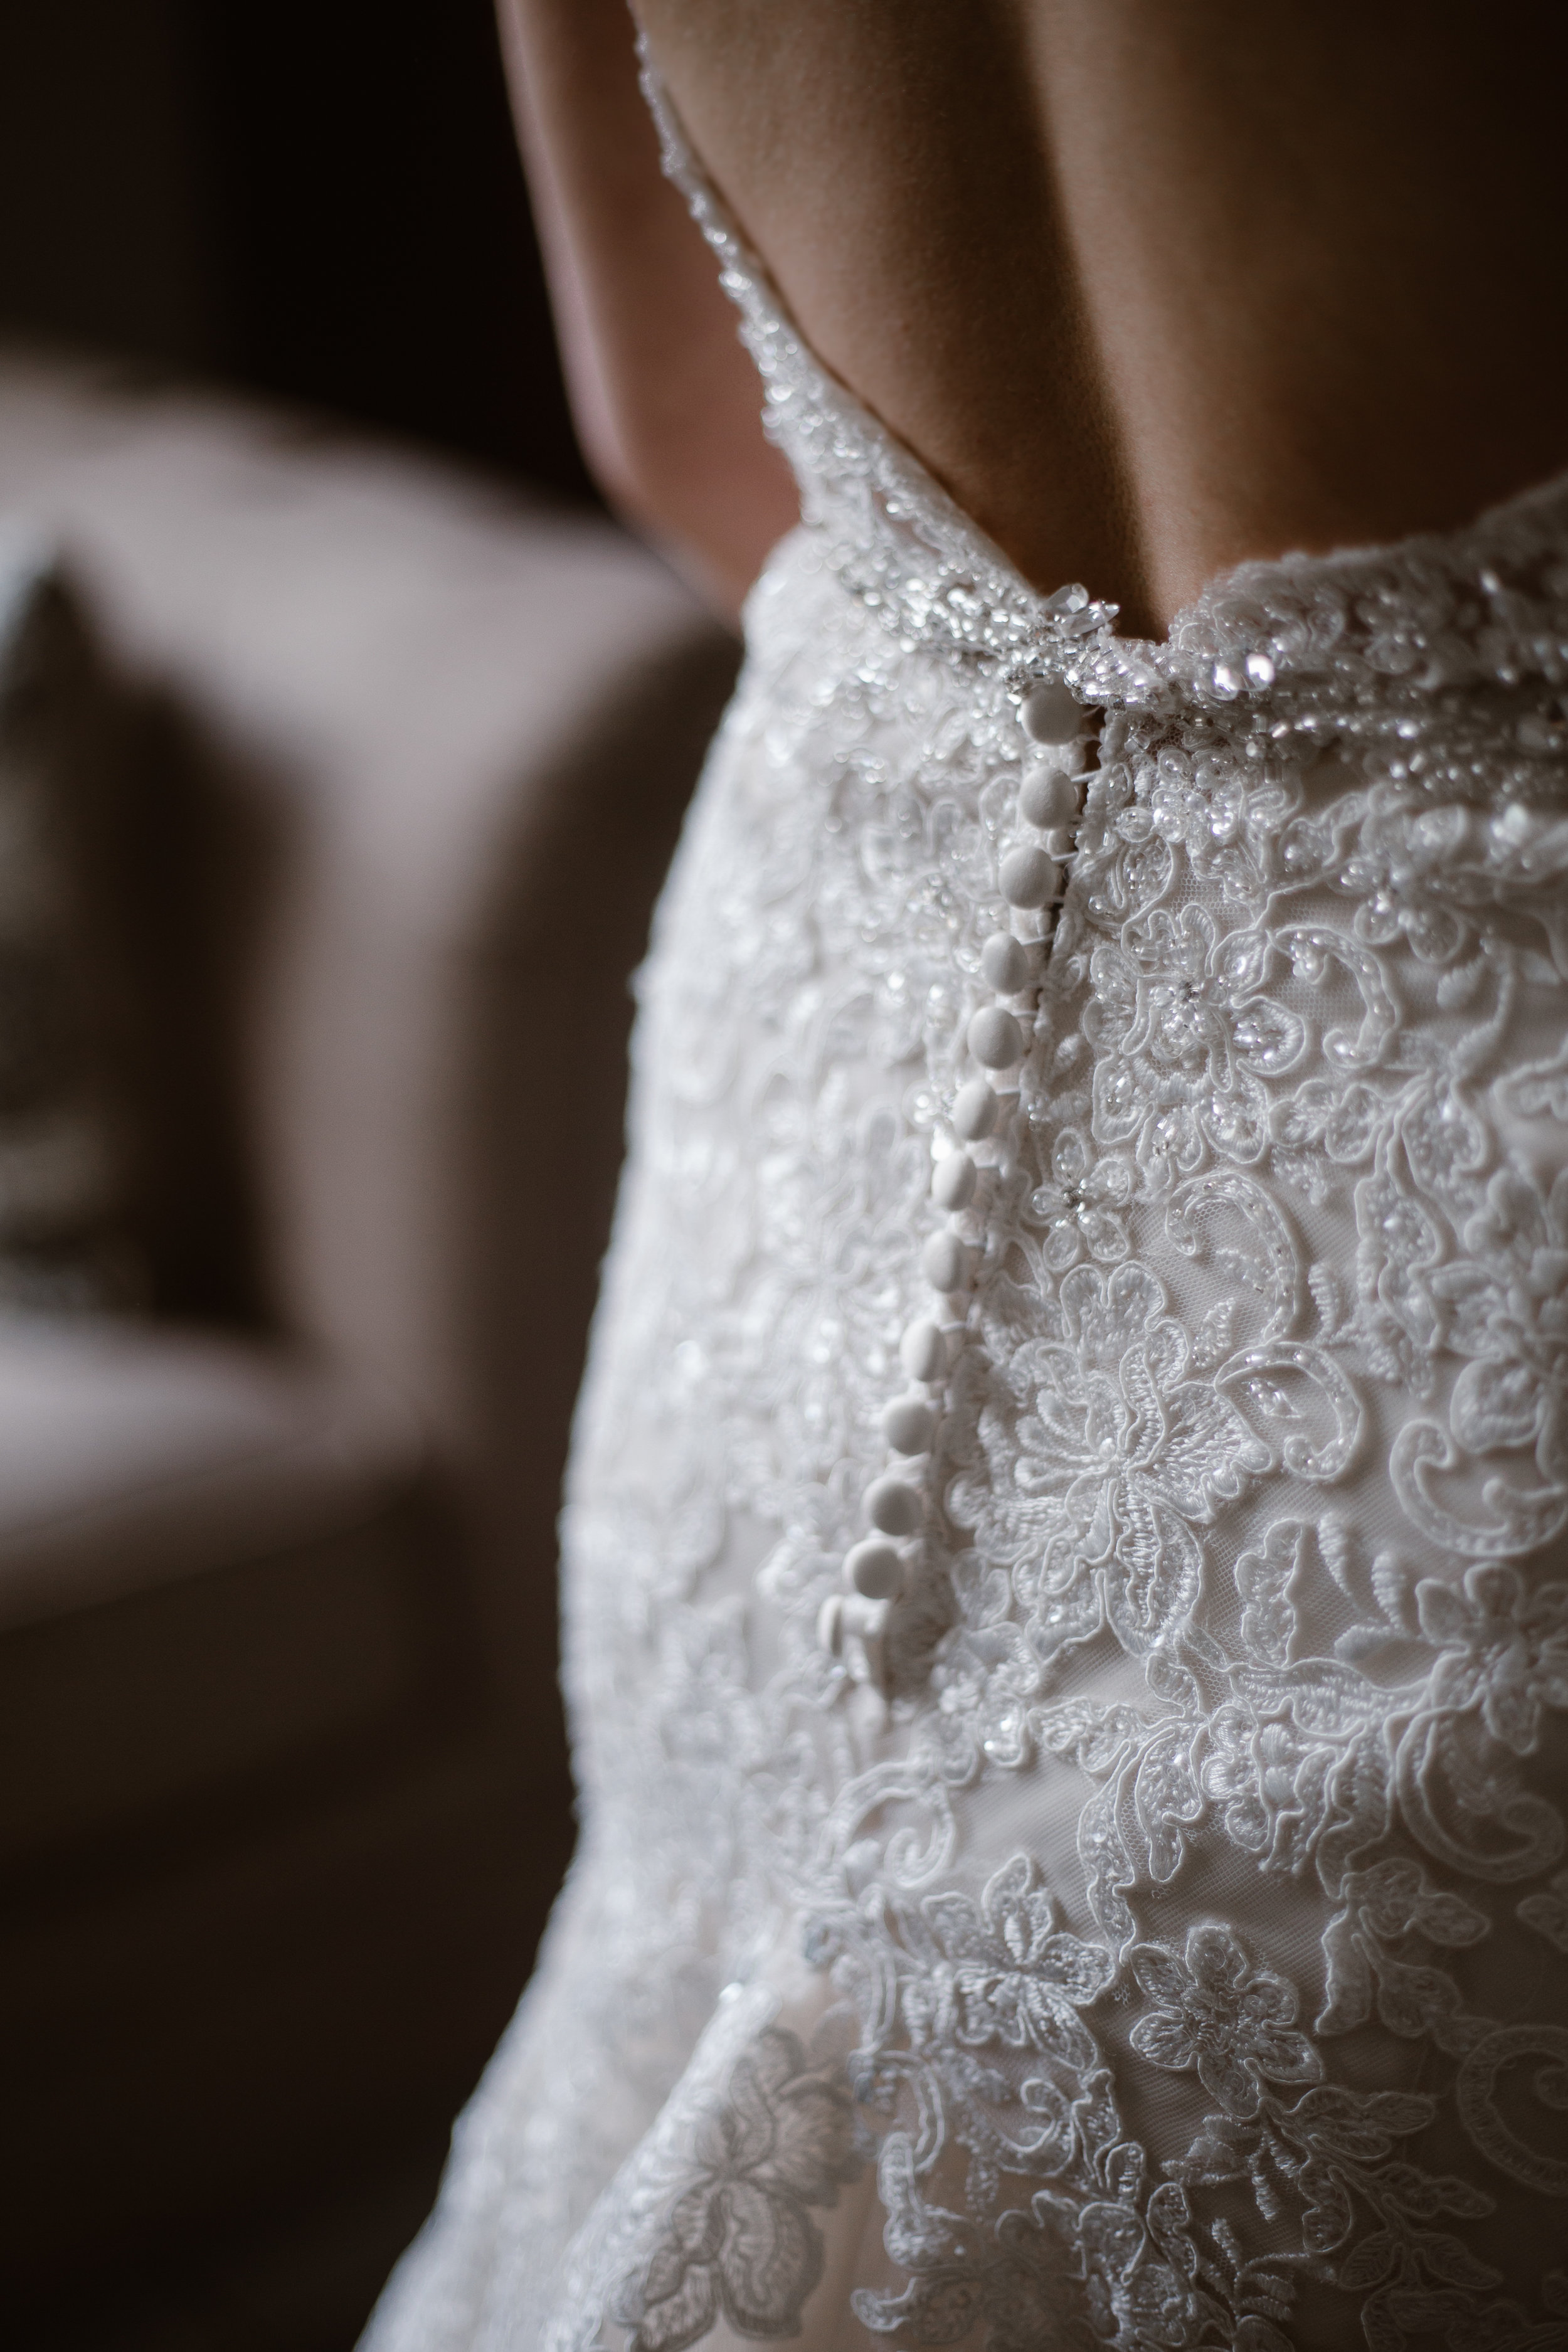 Button Down mermaid Bridal Gown - A Burgundy + Bronze Ramble Creek Fall Wedding - Erin Morrison Photography